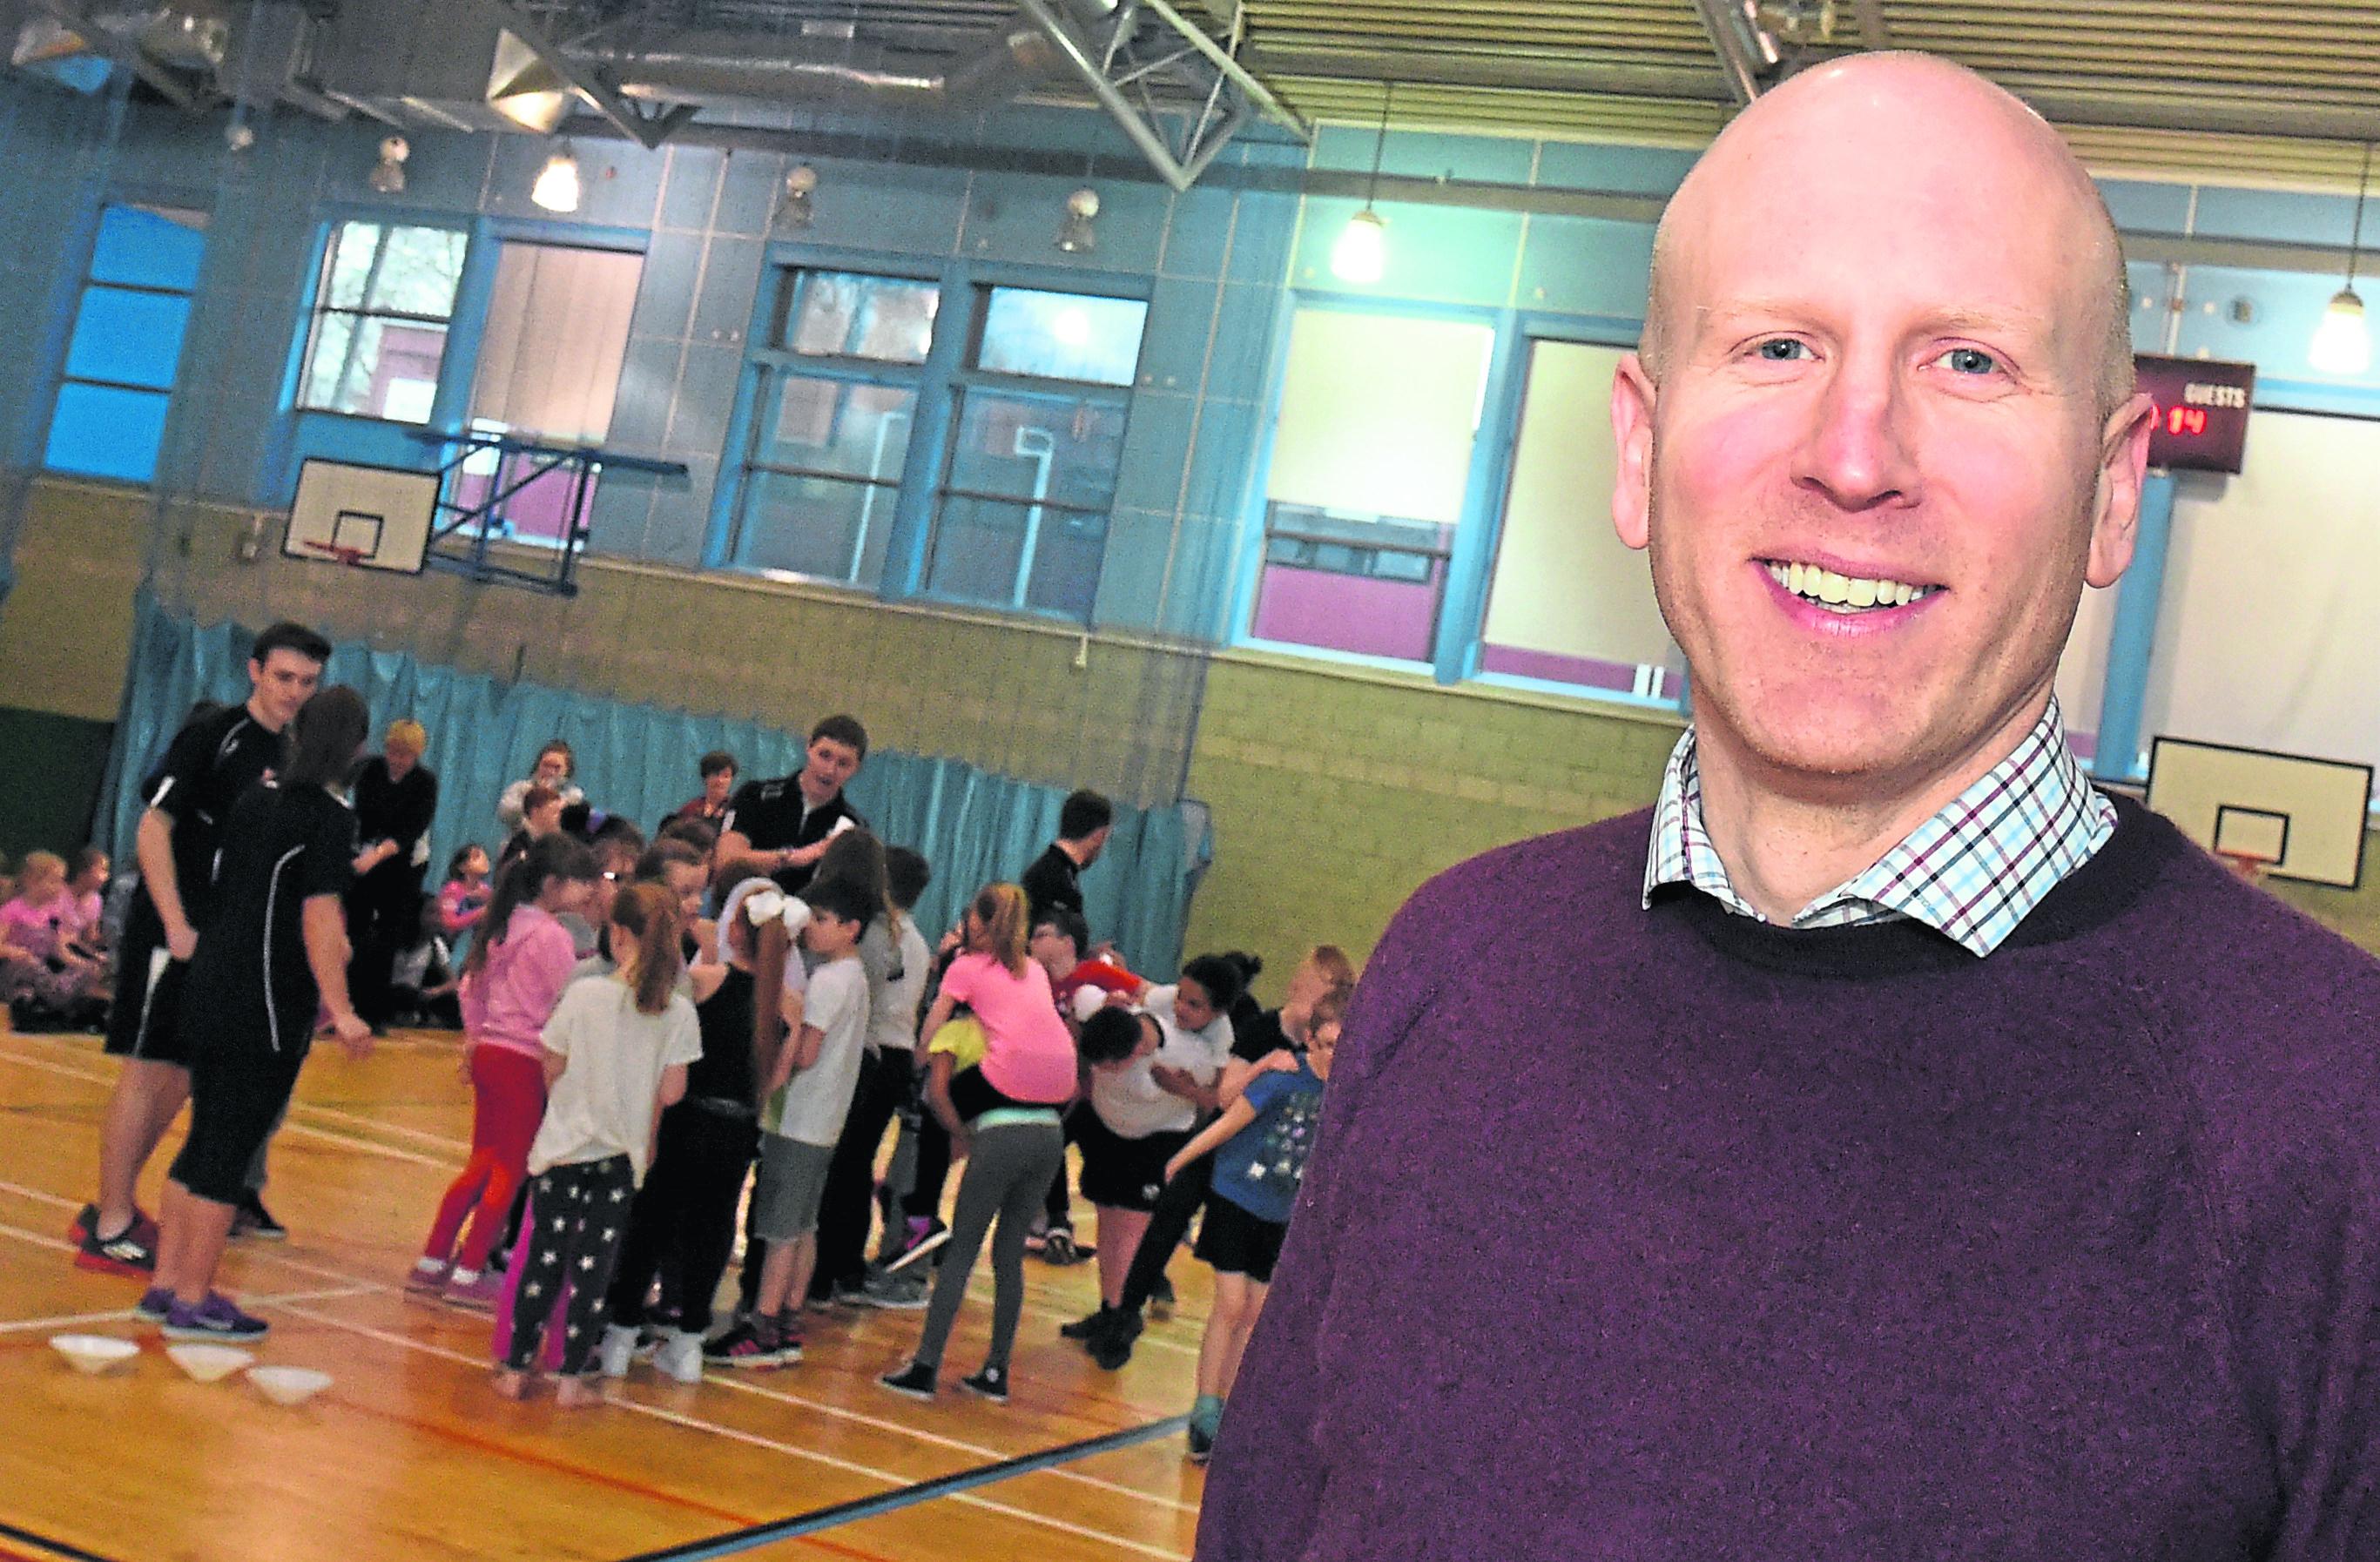 Sport Aberdeen's Graeme Dale